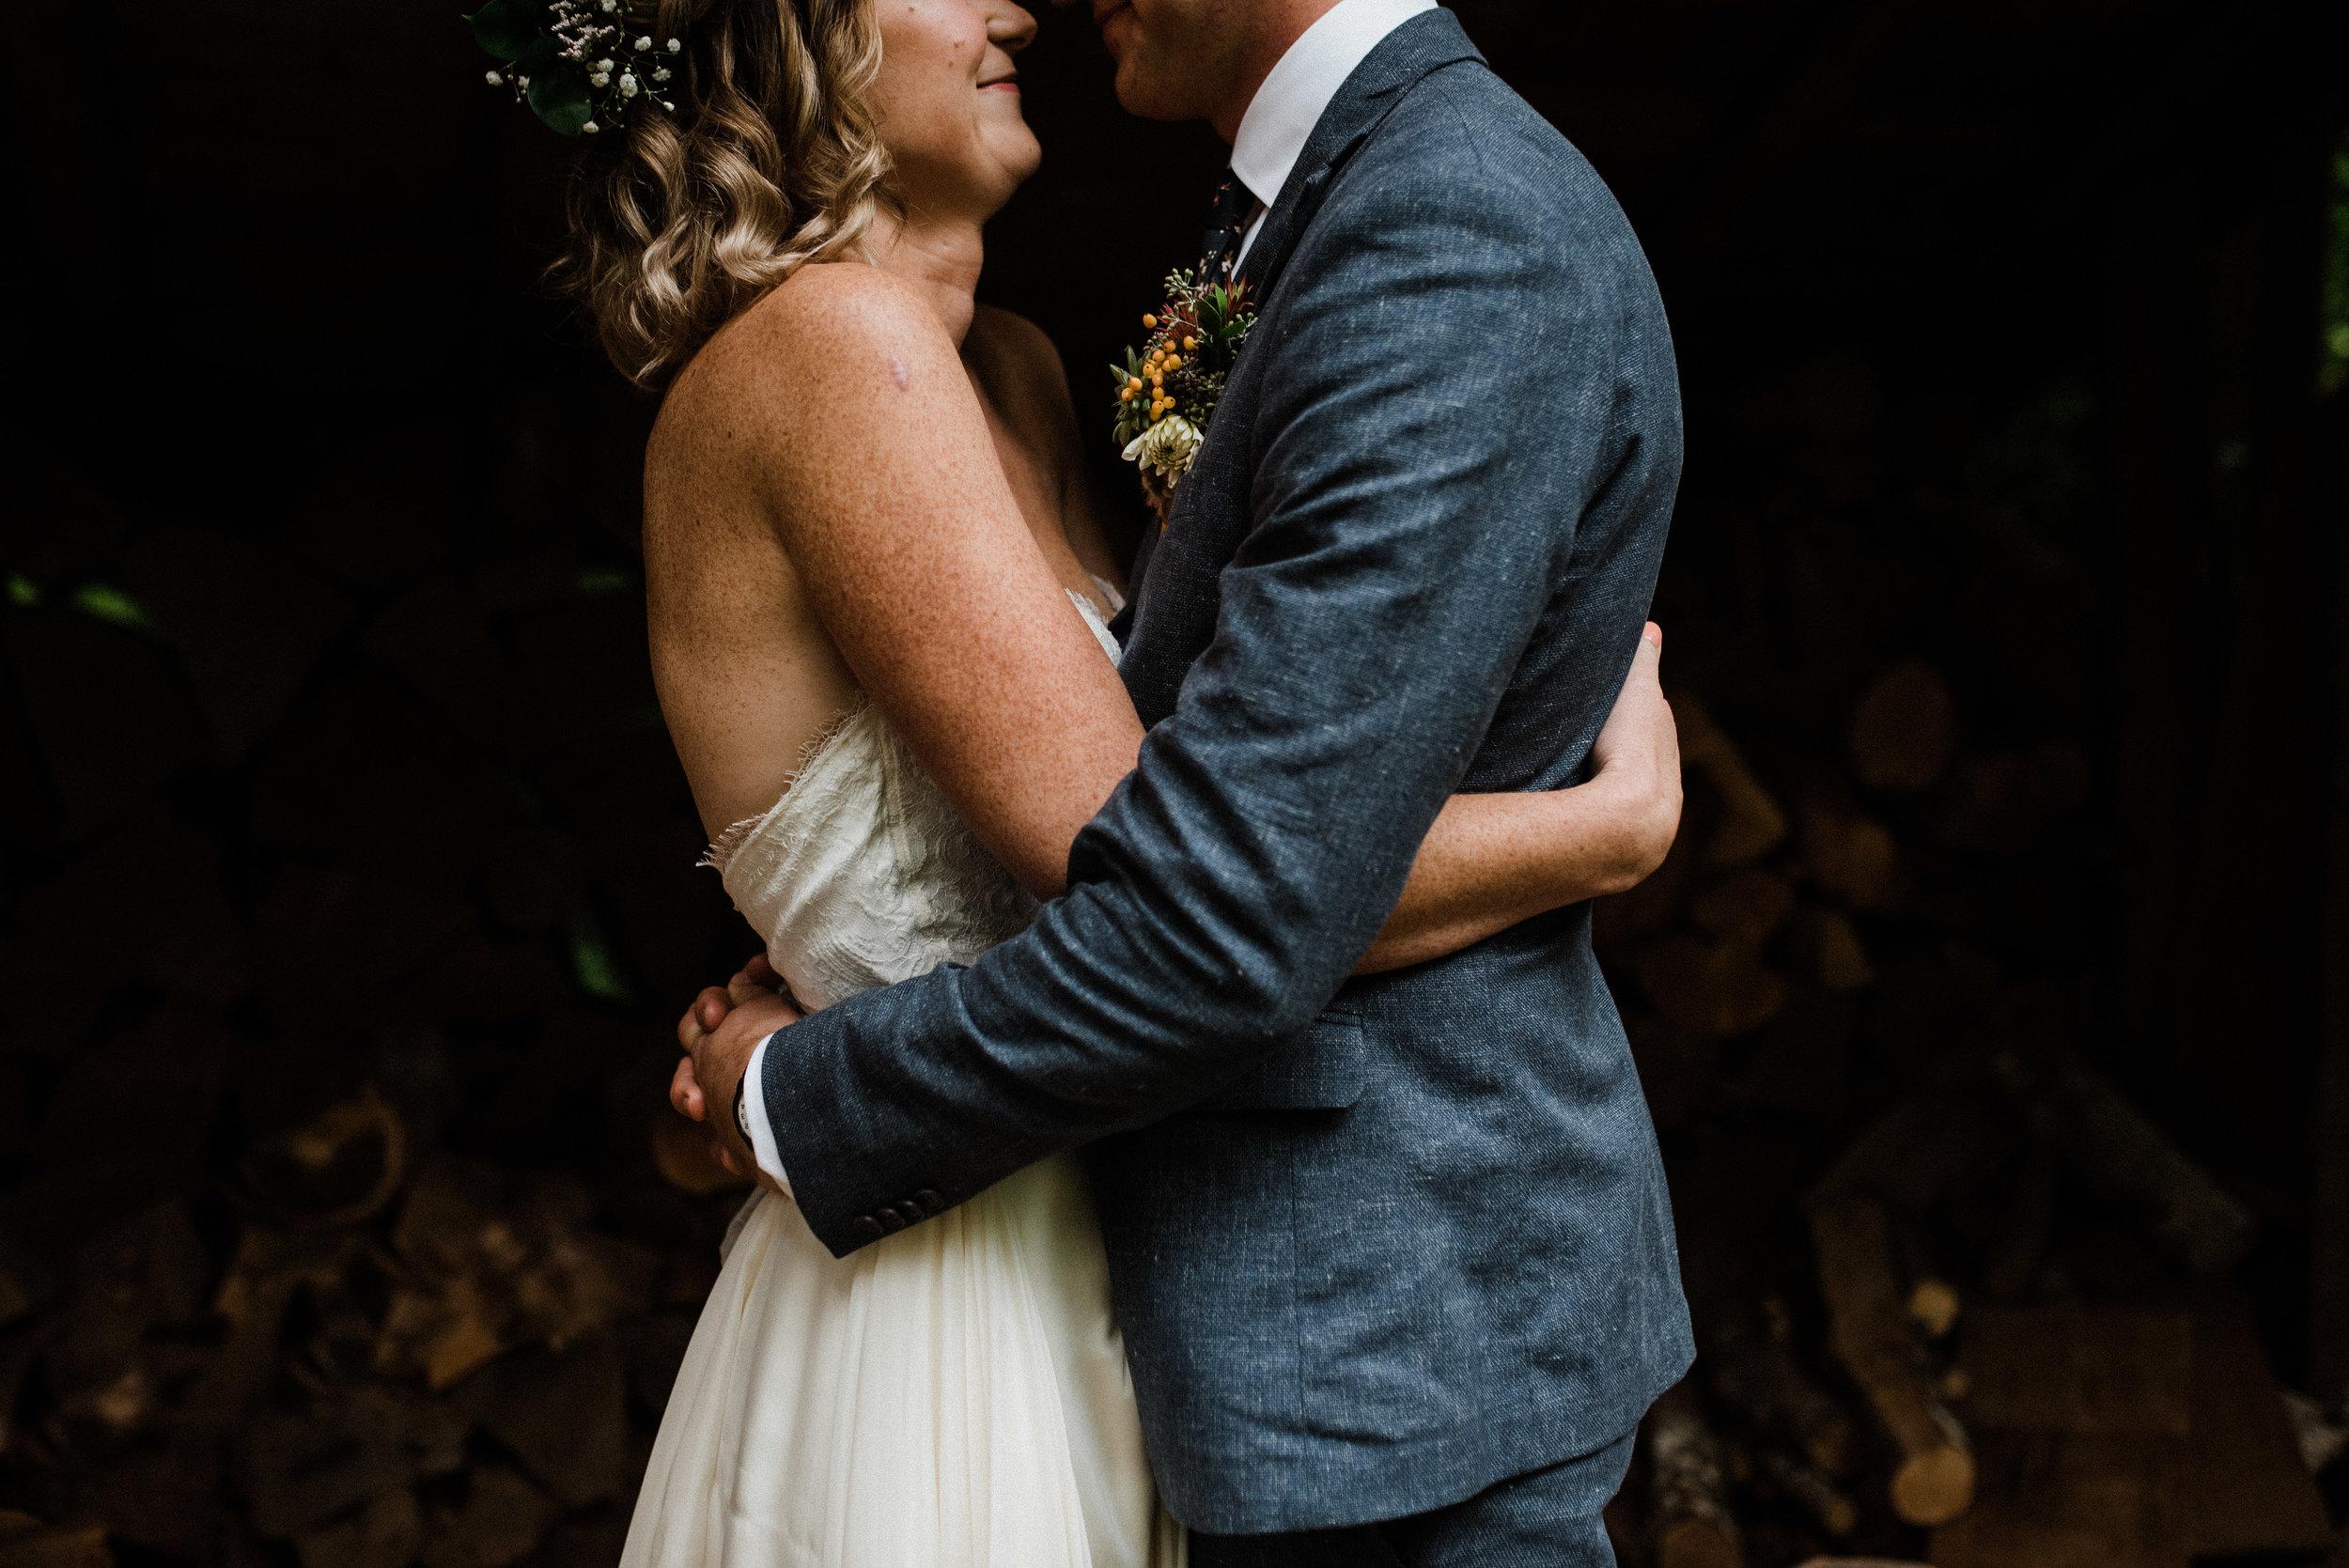 Zach + Shawnee - Boho DIY Wedding in the woods | Seattle, WA